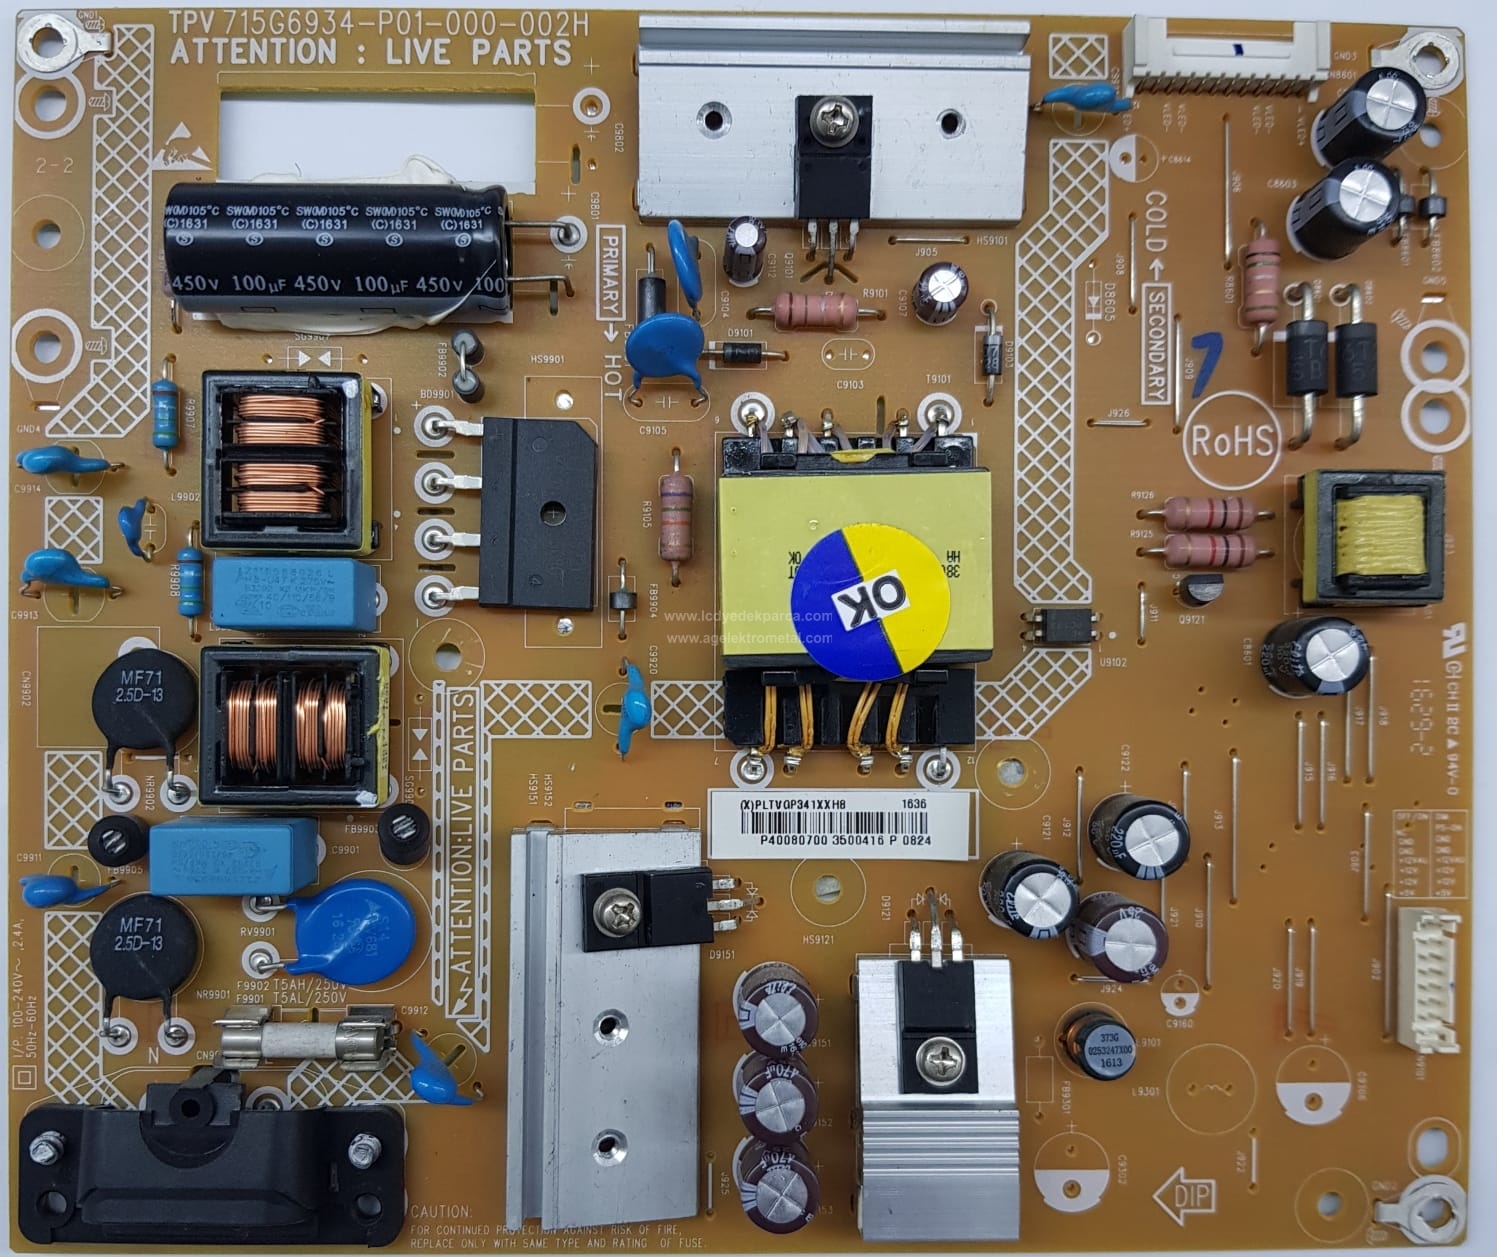 715G6934-P01-000-002H , 40PFK4101/12 , TPT400LA , Power Board , Besleme Kartı , PSU